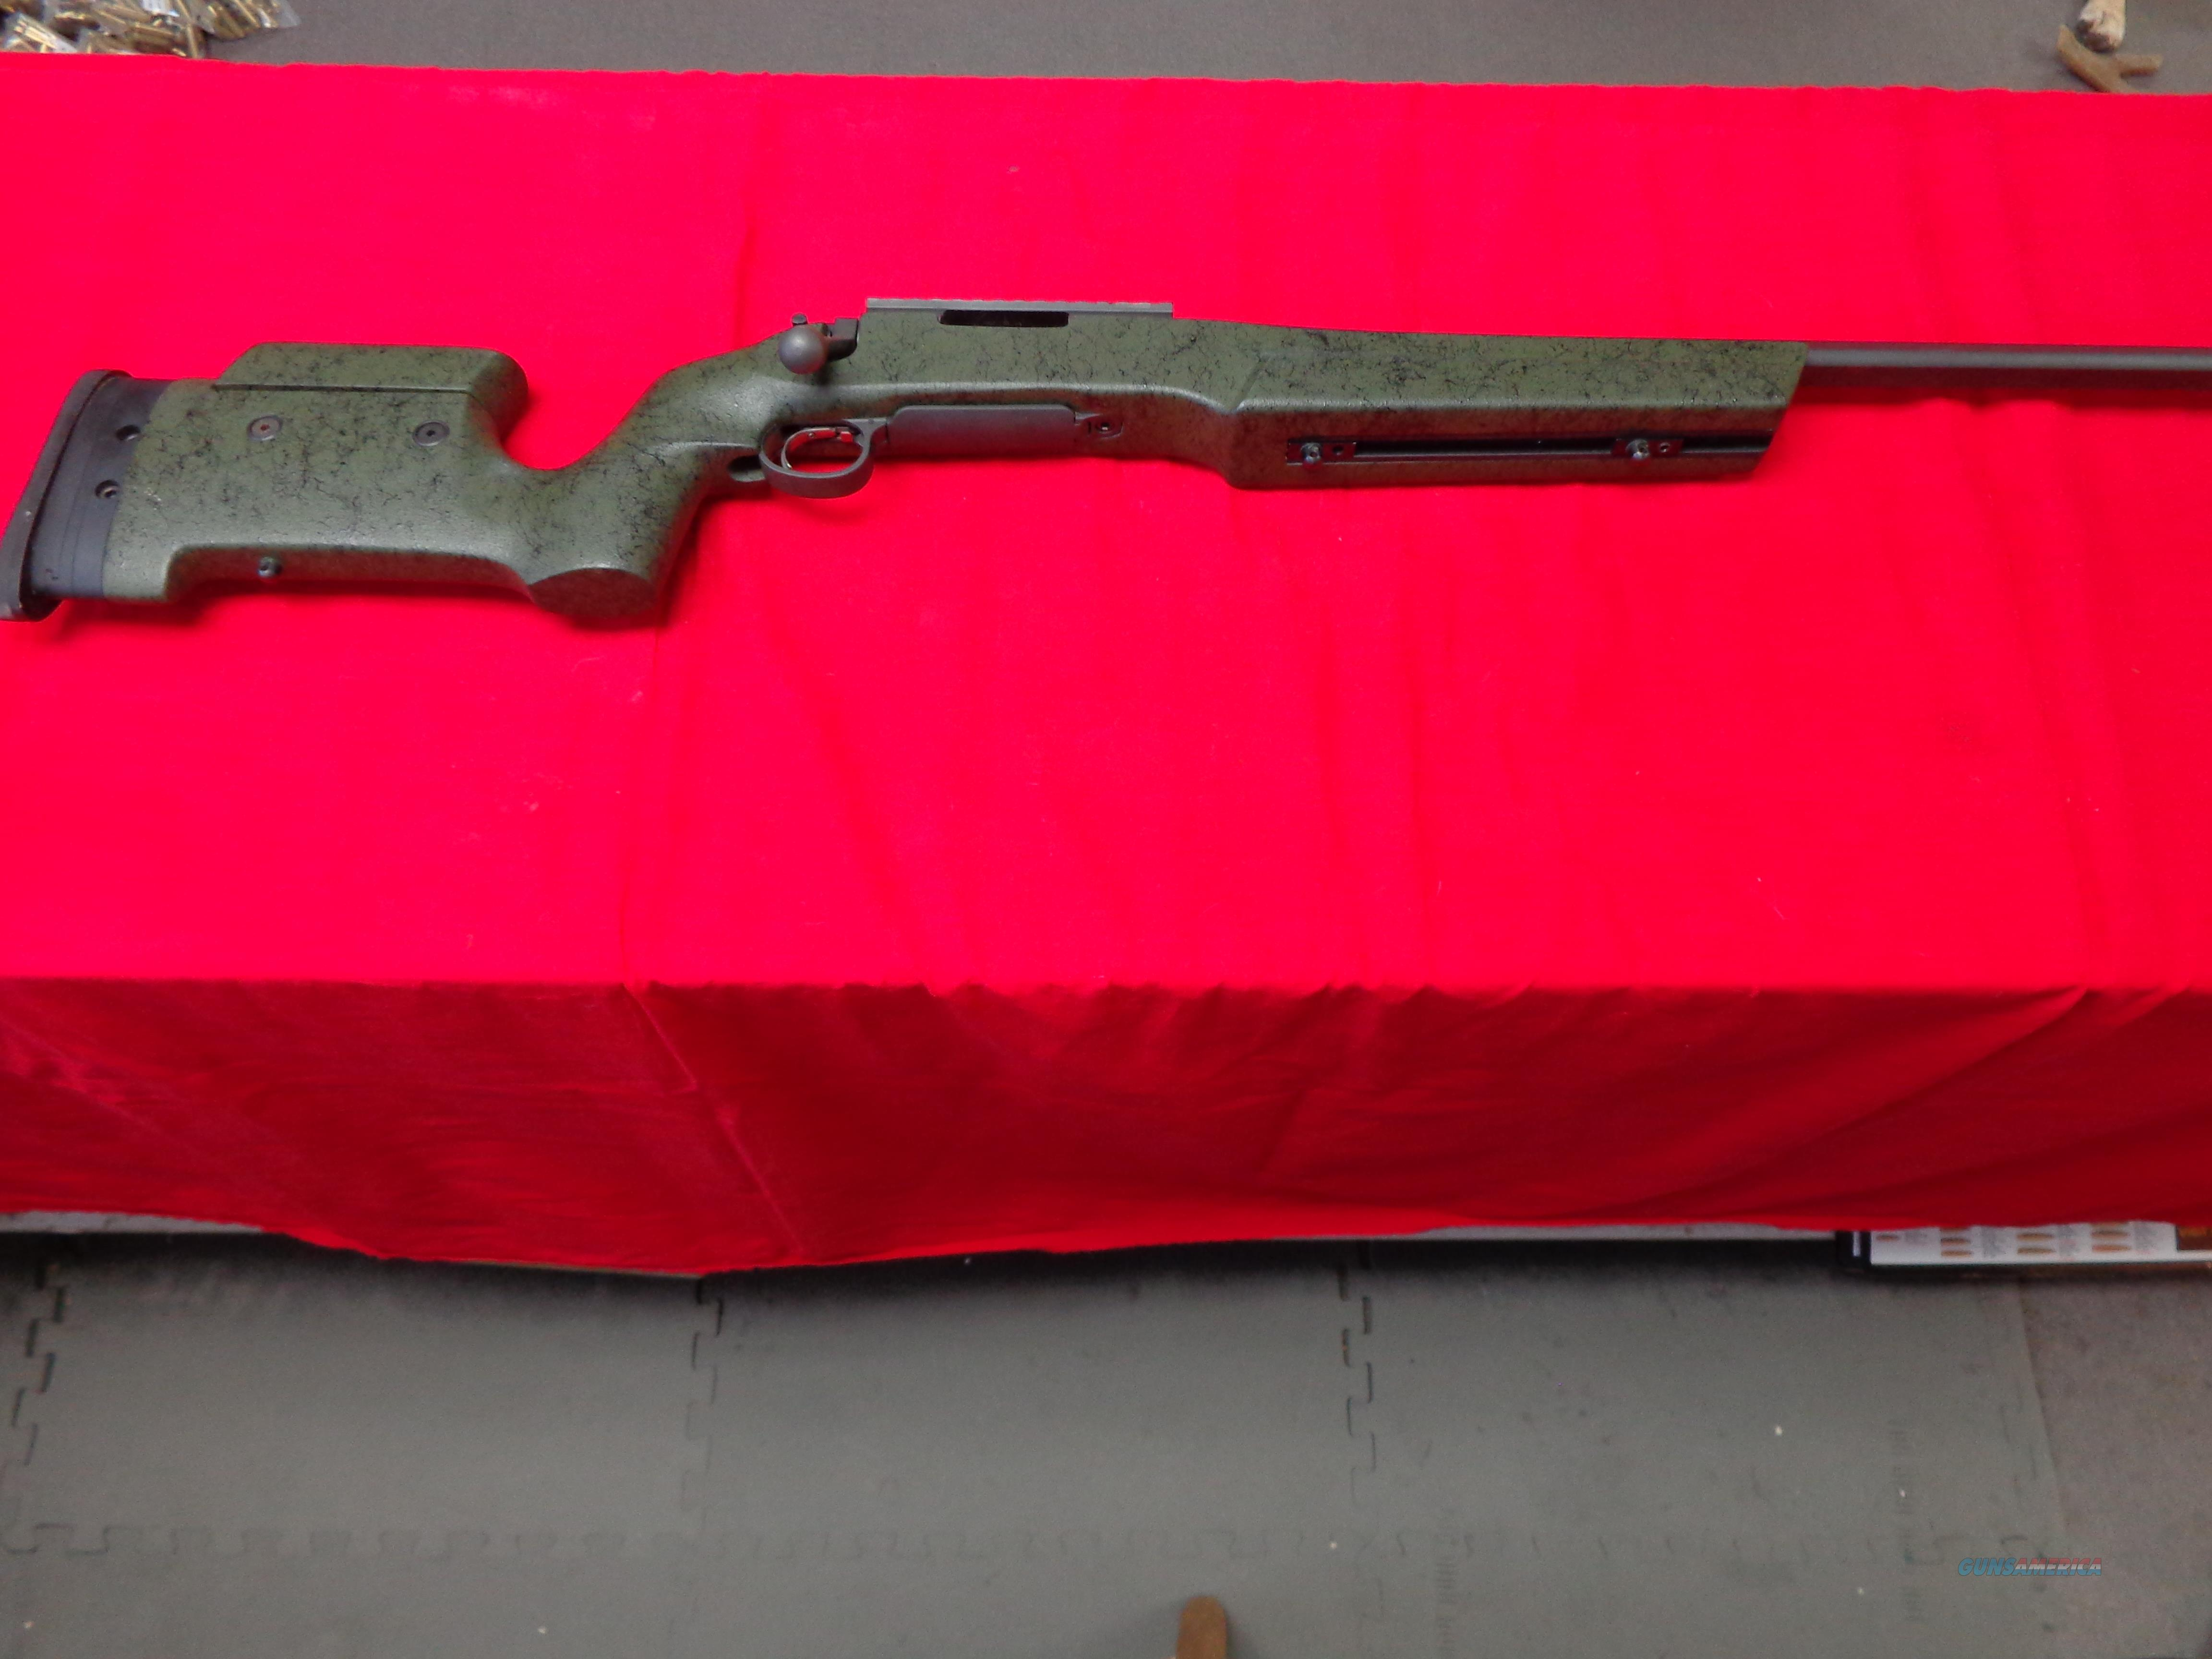 REMINGTON 700 TARGET TACTICAL VTR IN 308  Guns > Rifles > Remington Rifles - Modern > Model 700 > Tactical